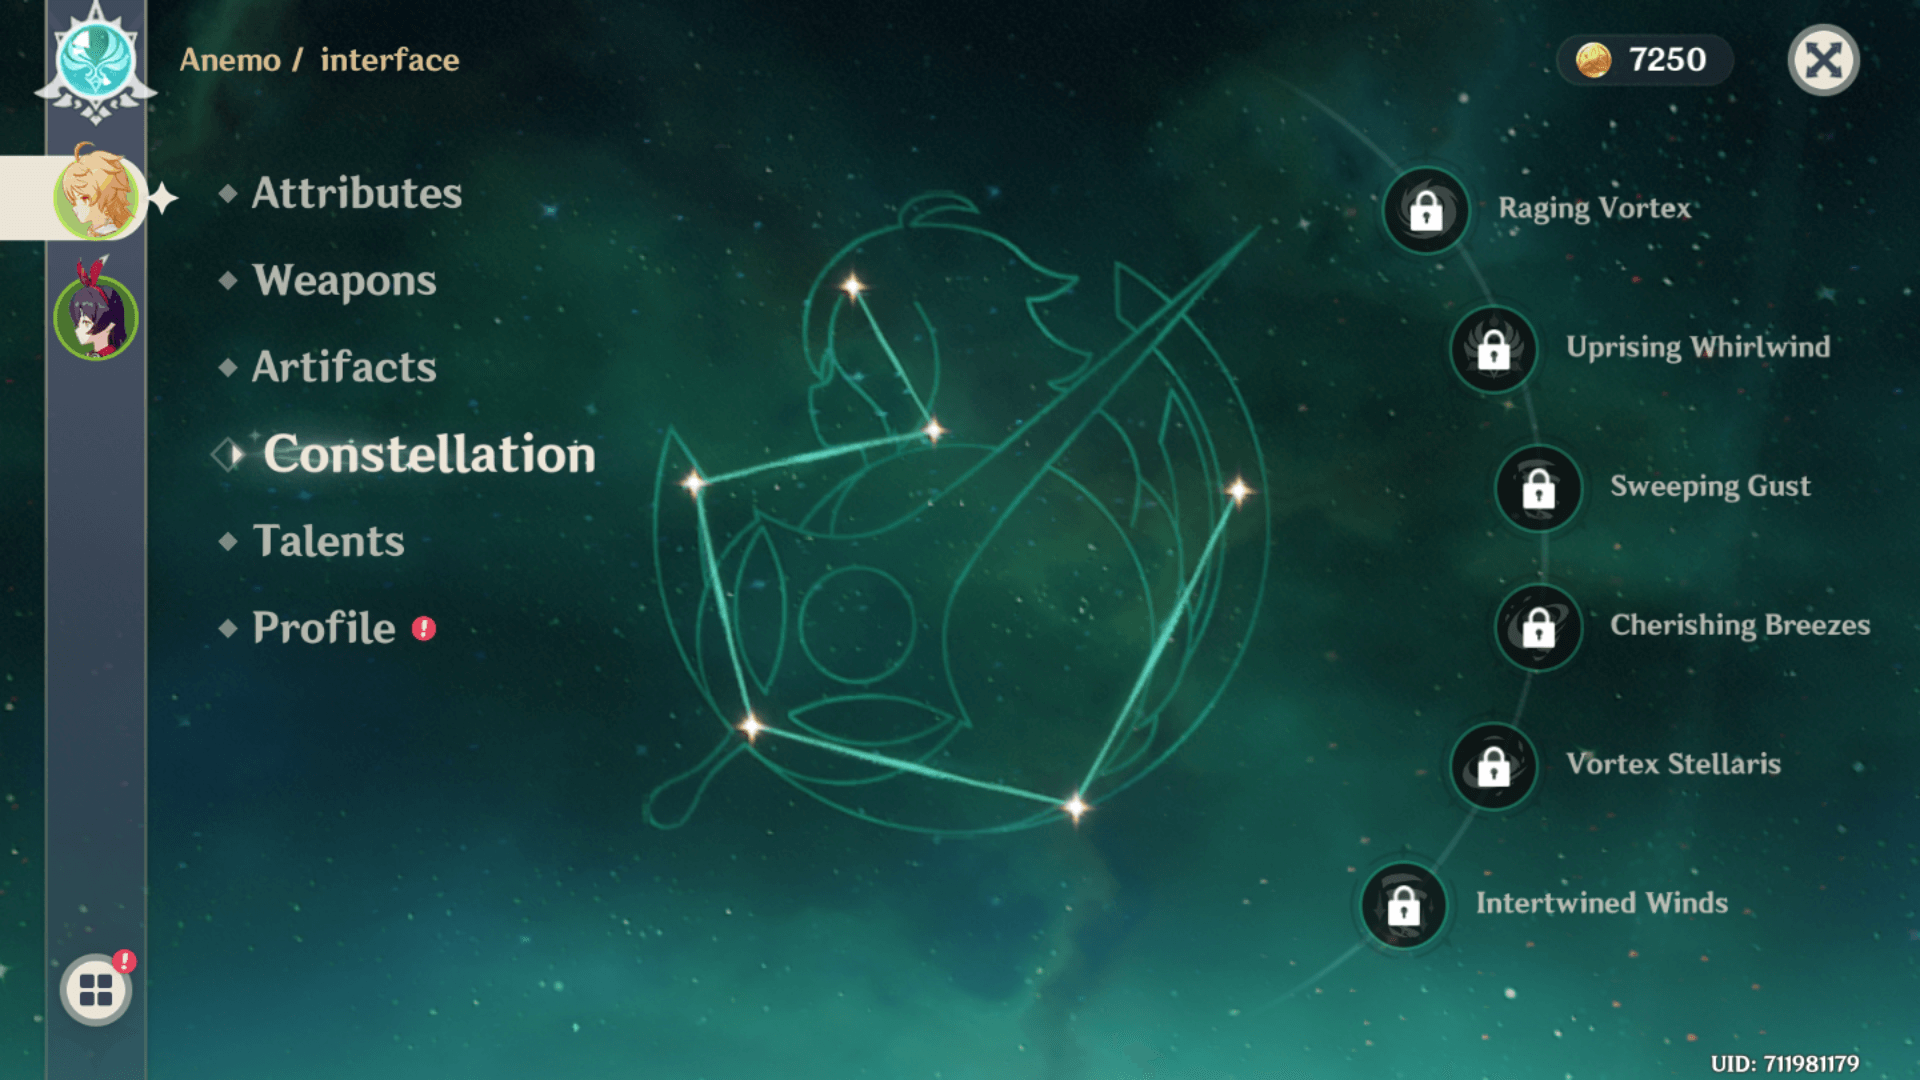 Constellation screenshot of Genshin Impact Mobile video game interface.